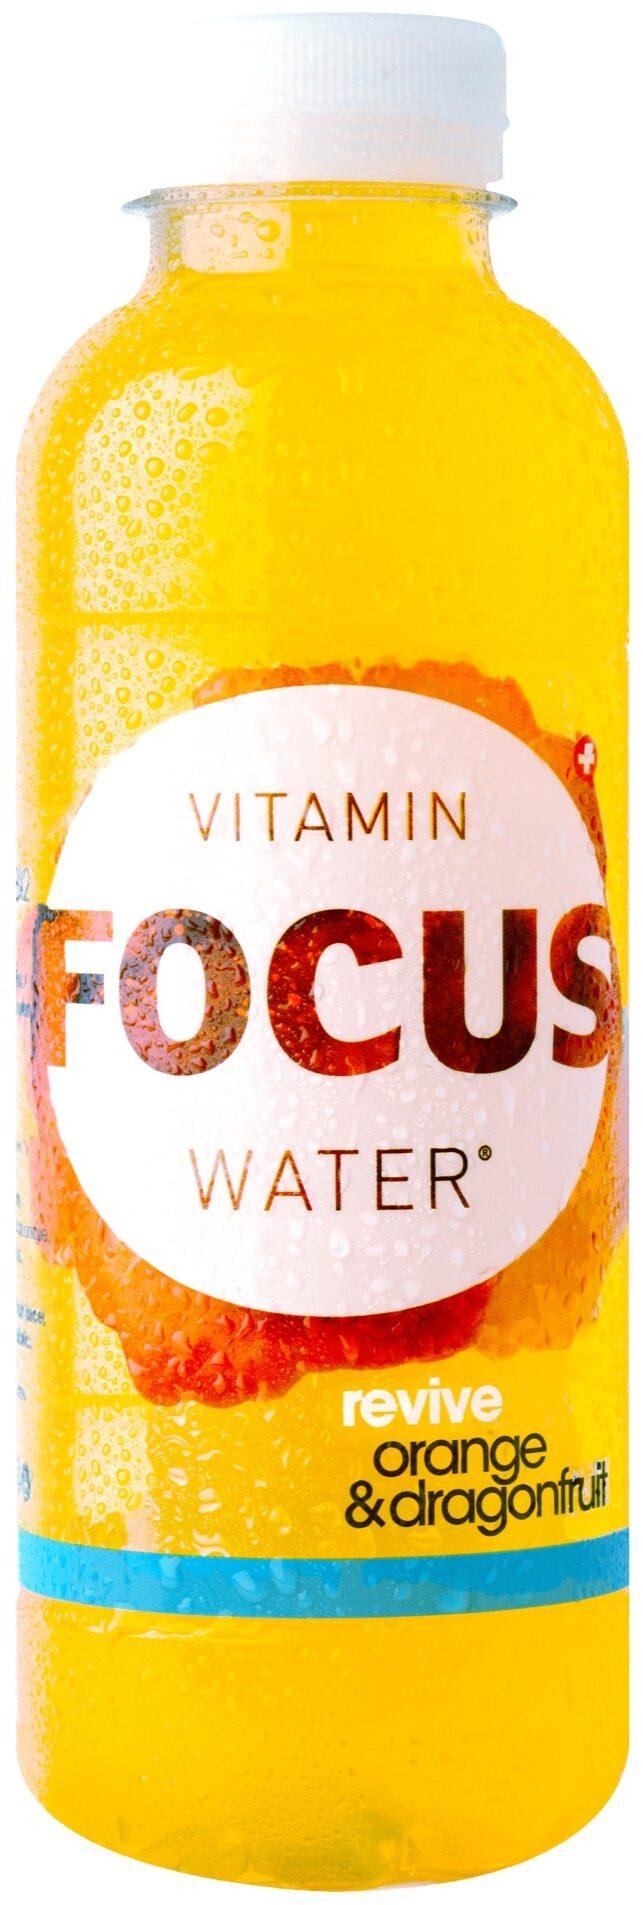 Focuswater Orange & Dragonfruit - Product